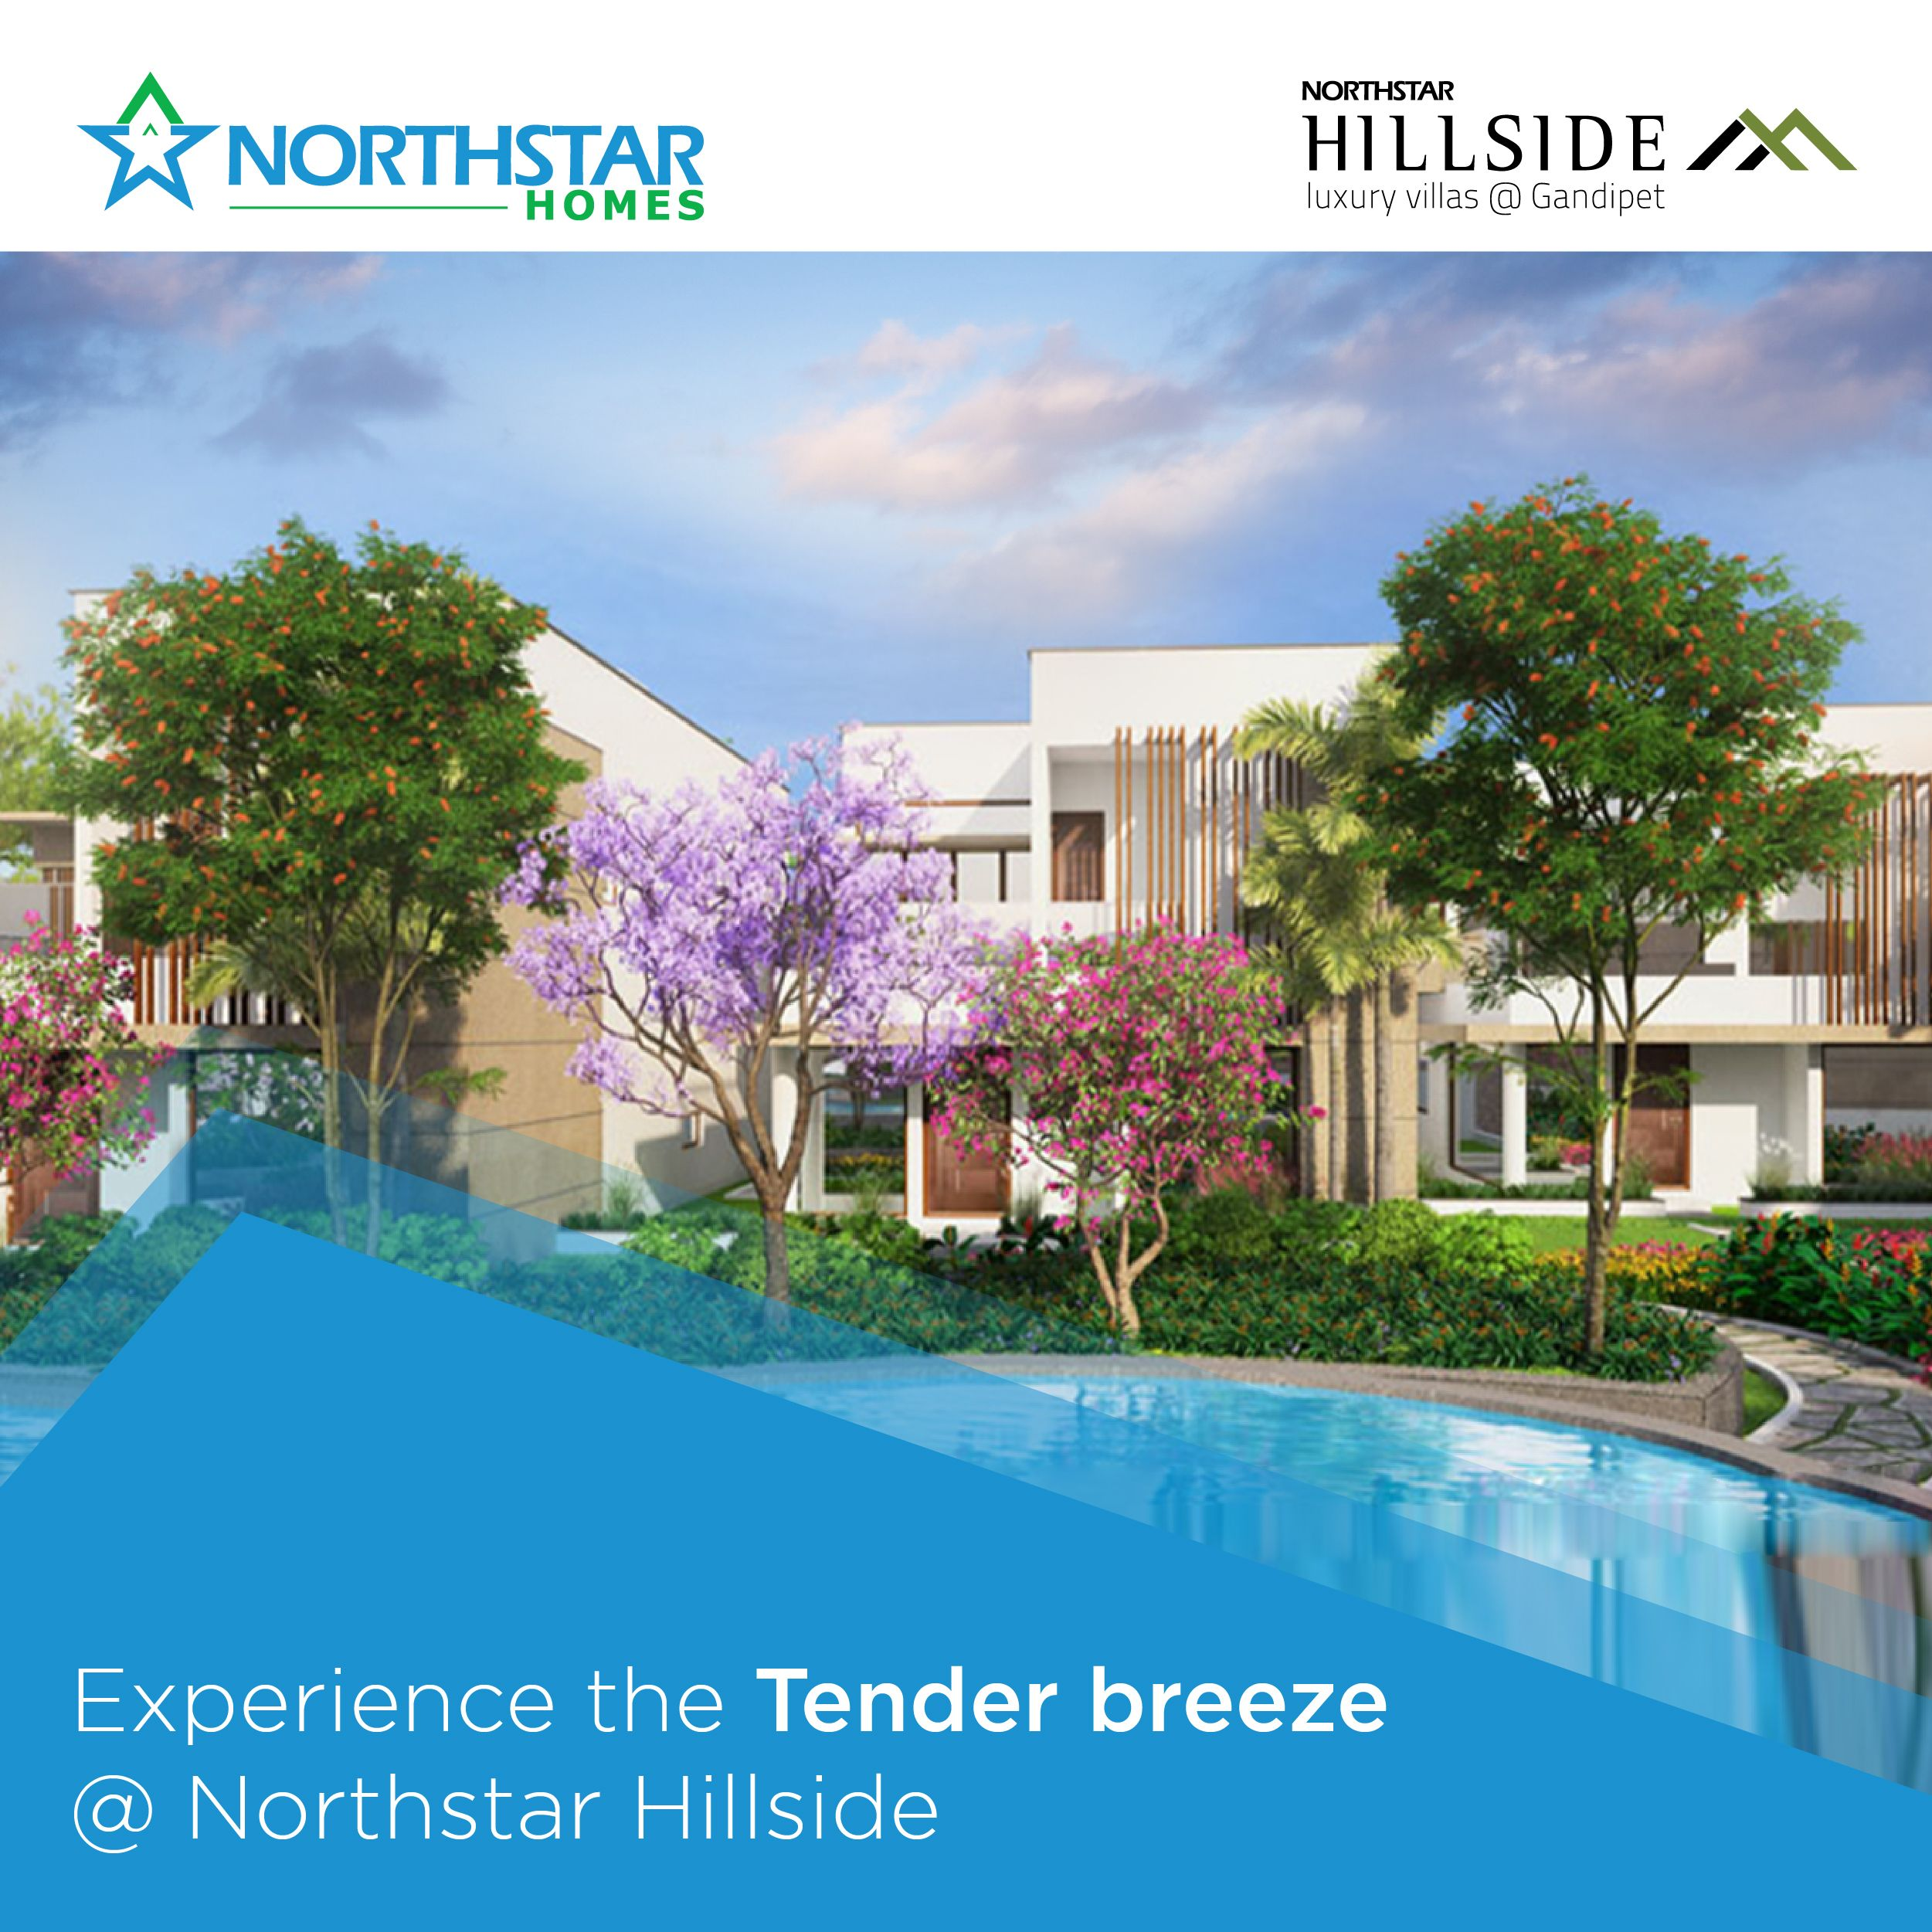 a43d3e8be26e21b3d0ce7c948b8f55d8 - Villa For Sale In Nectar Gardens Madhapur